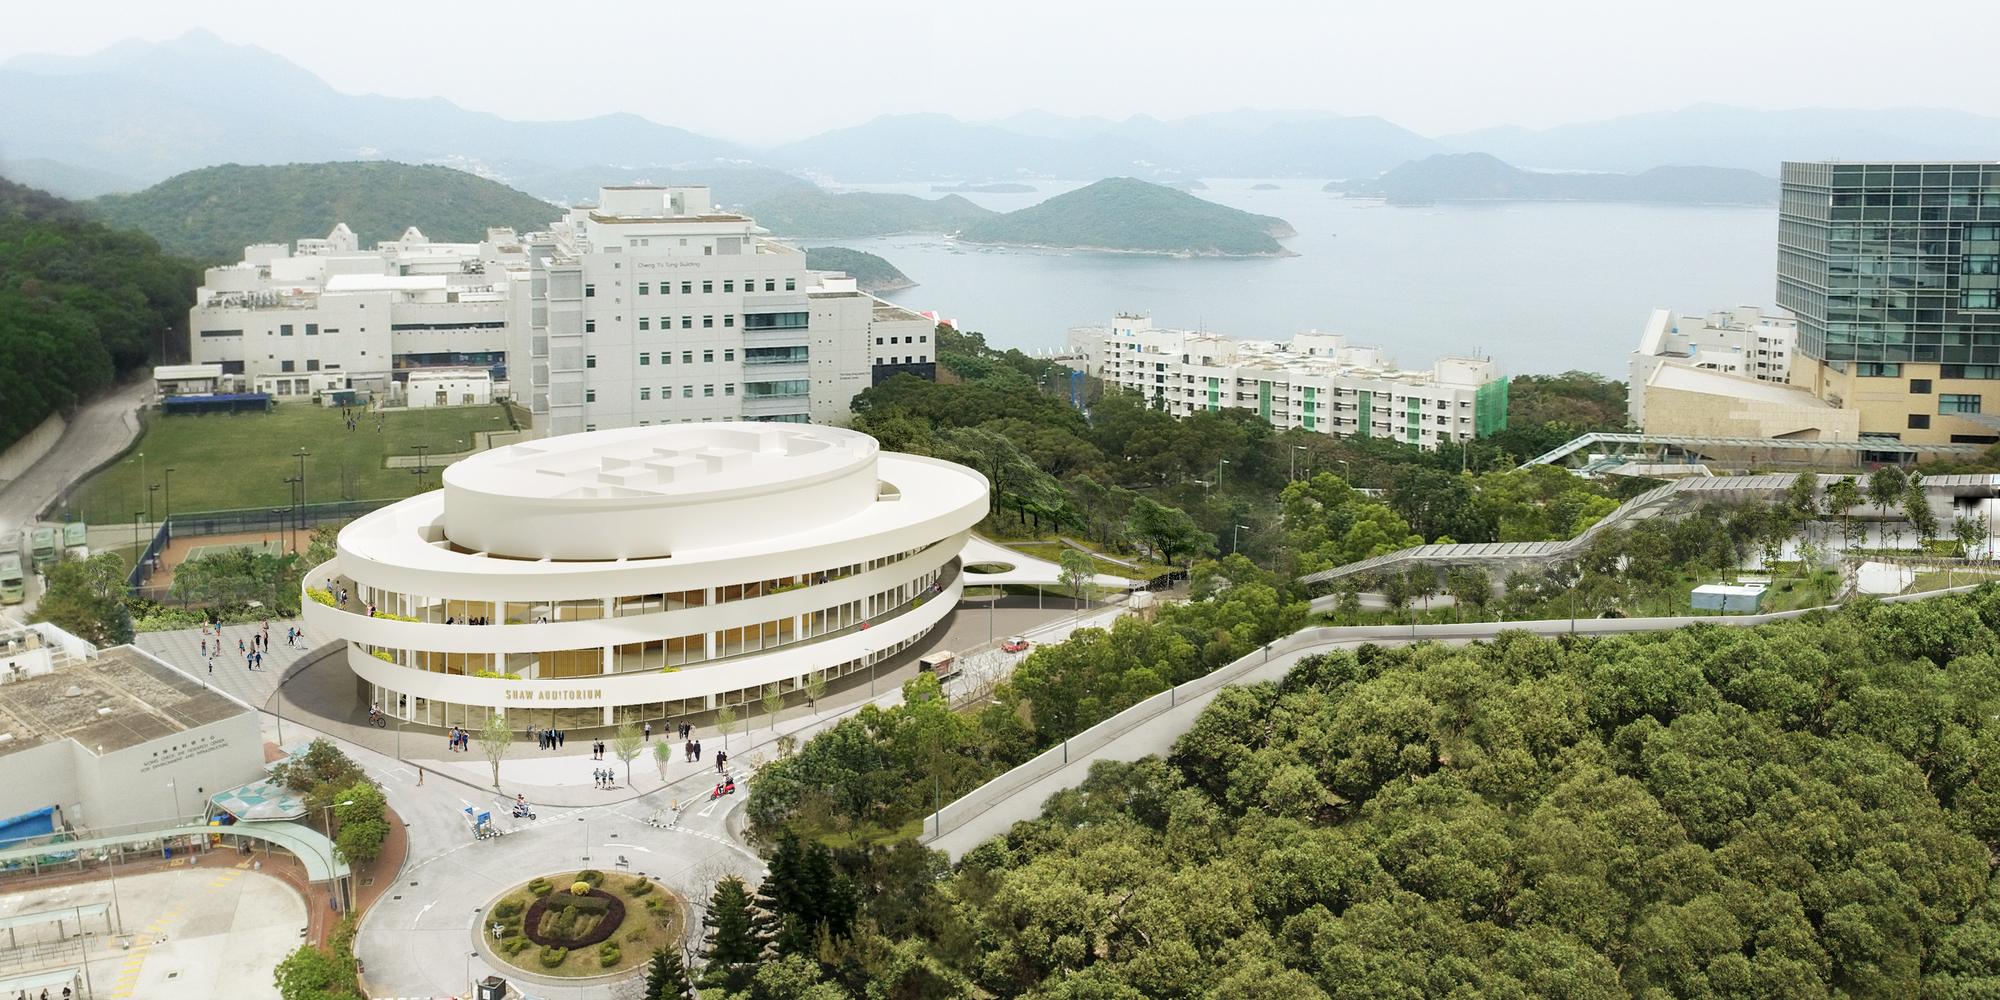 Henning Larsen Designs Elliptical Auditorium for Hong Kong University of Science and Technology